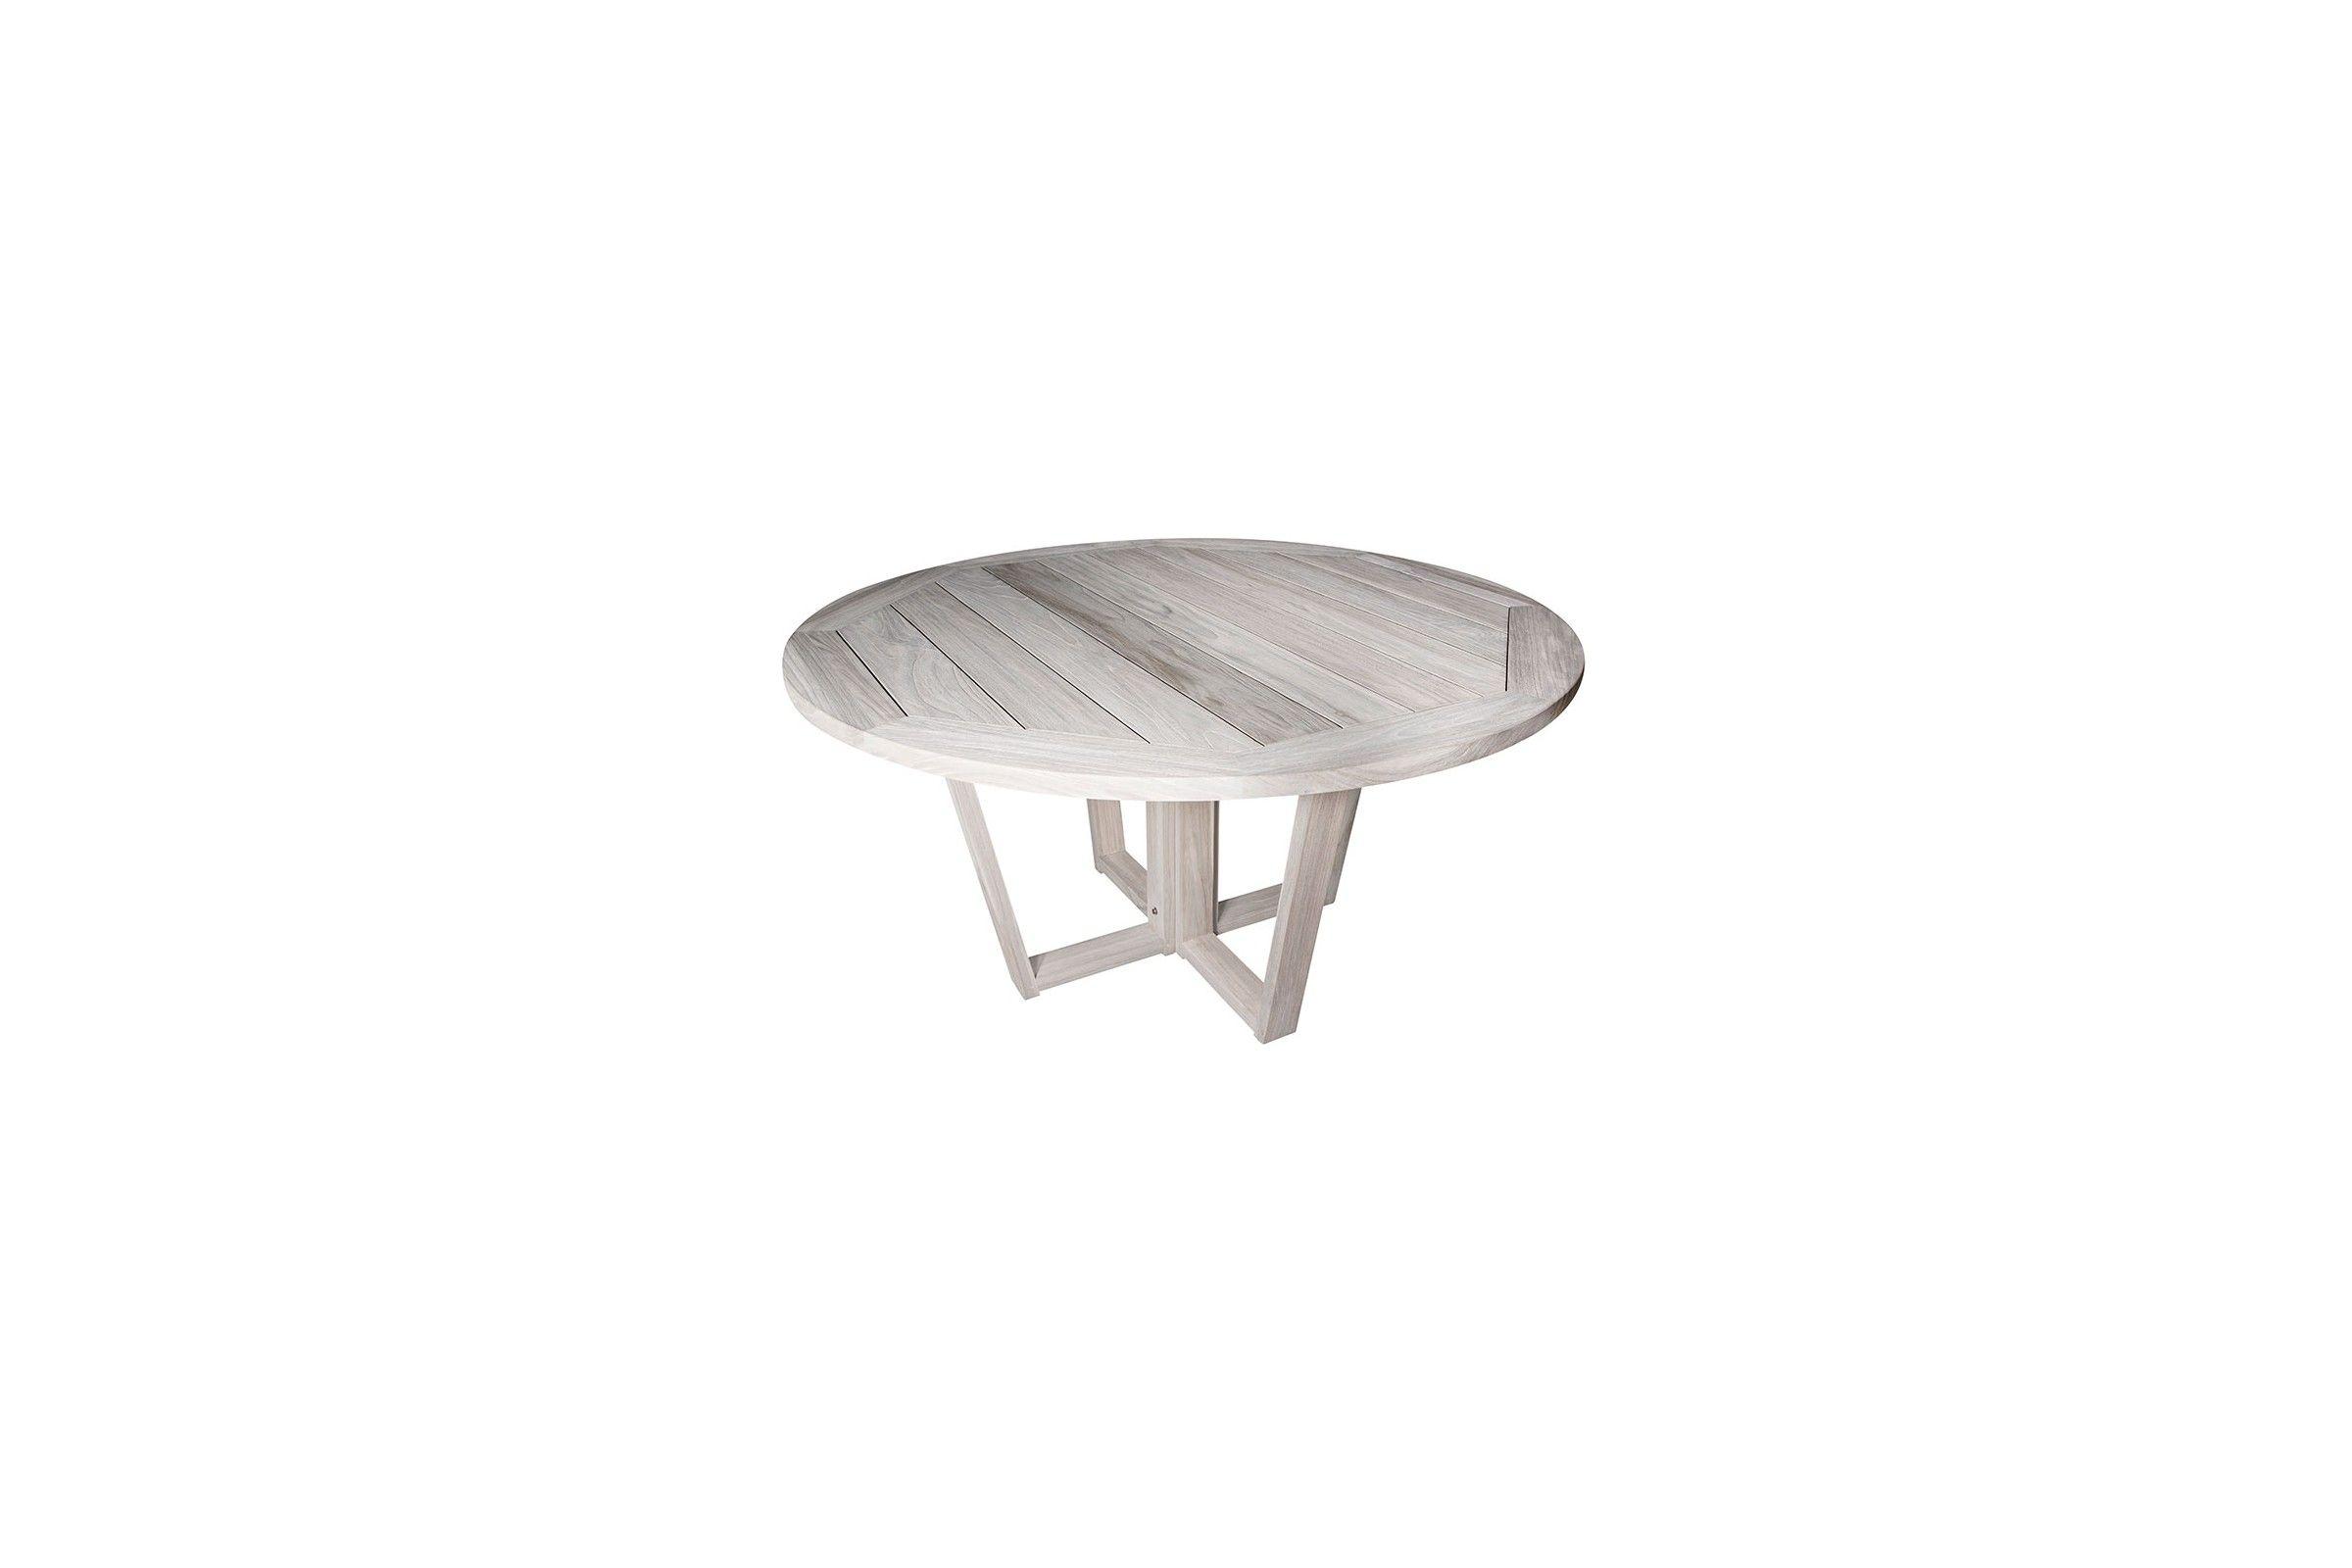 table ronde teck 150 table de lit. Black Bedroom Furniture Sets. Home Design Ideas